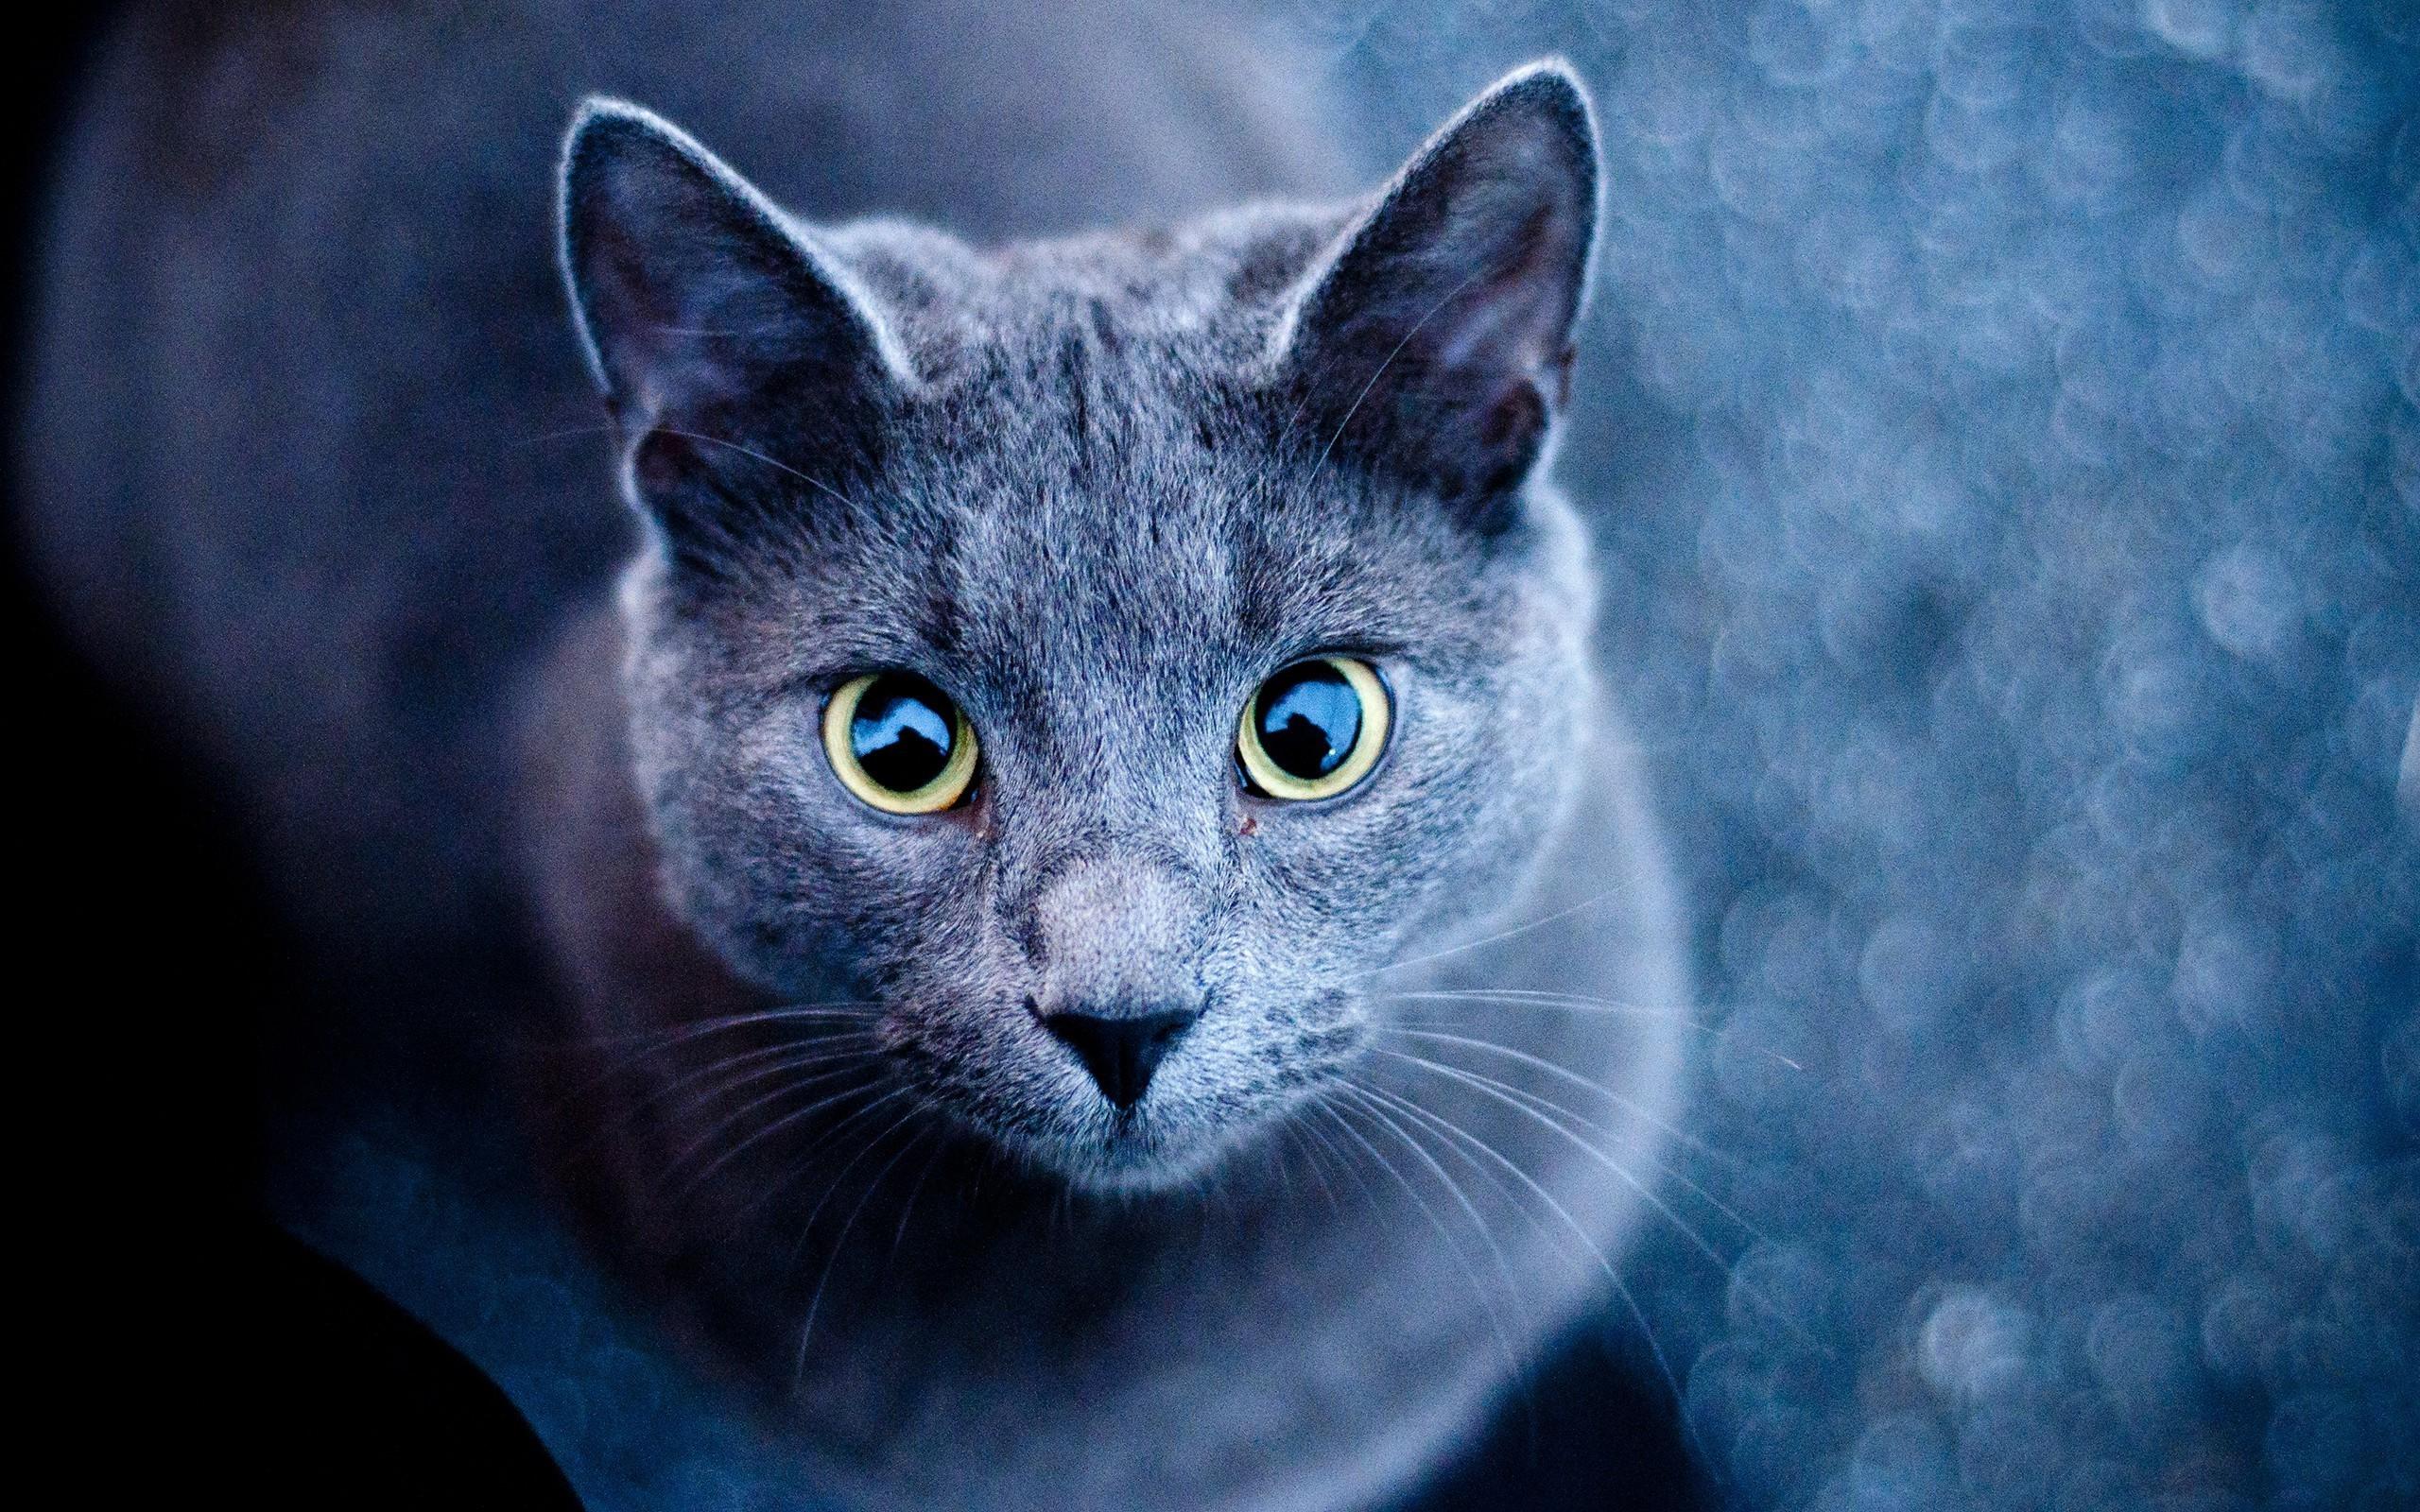 Ios 11 Hd Wallpaper Wallpaper 2560x1600 Px Animals Cat Russian Blue